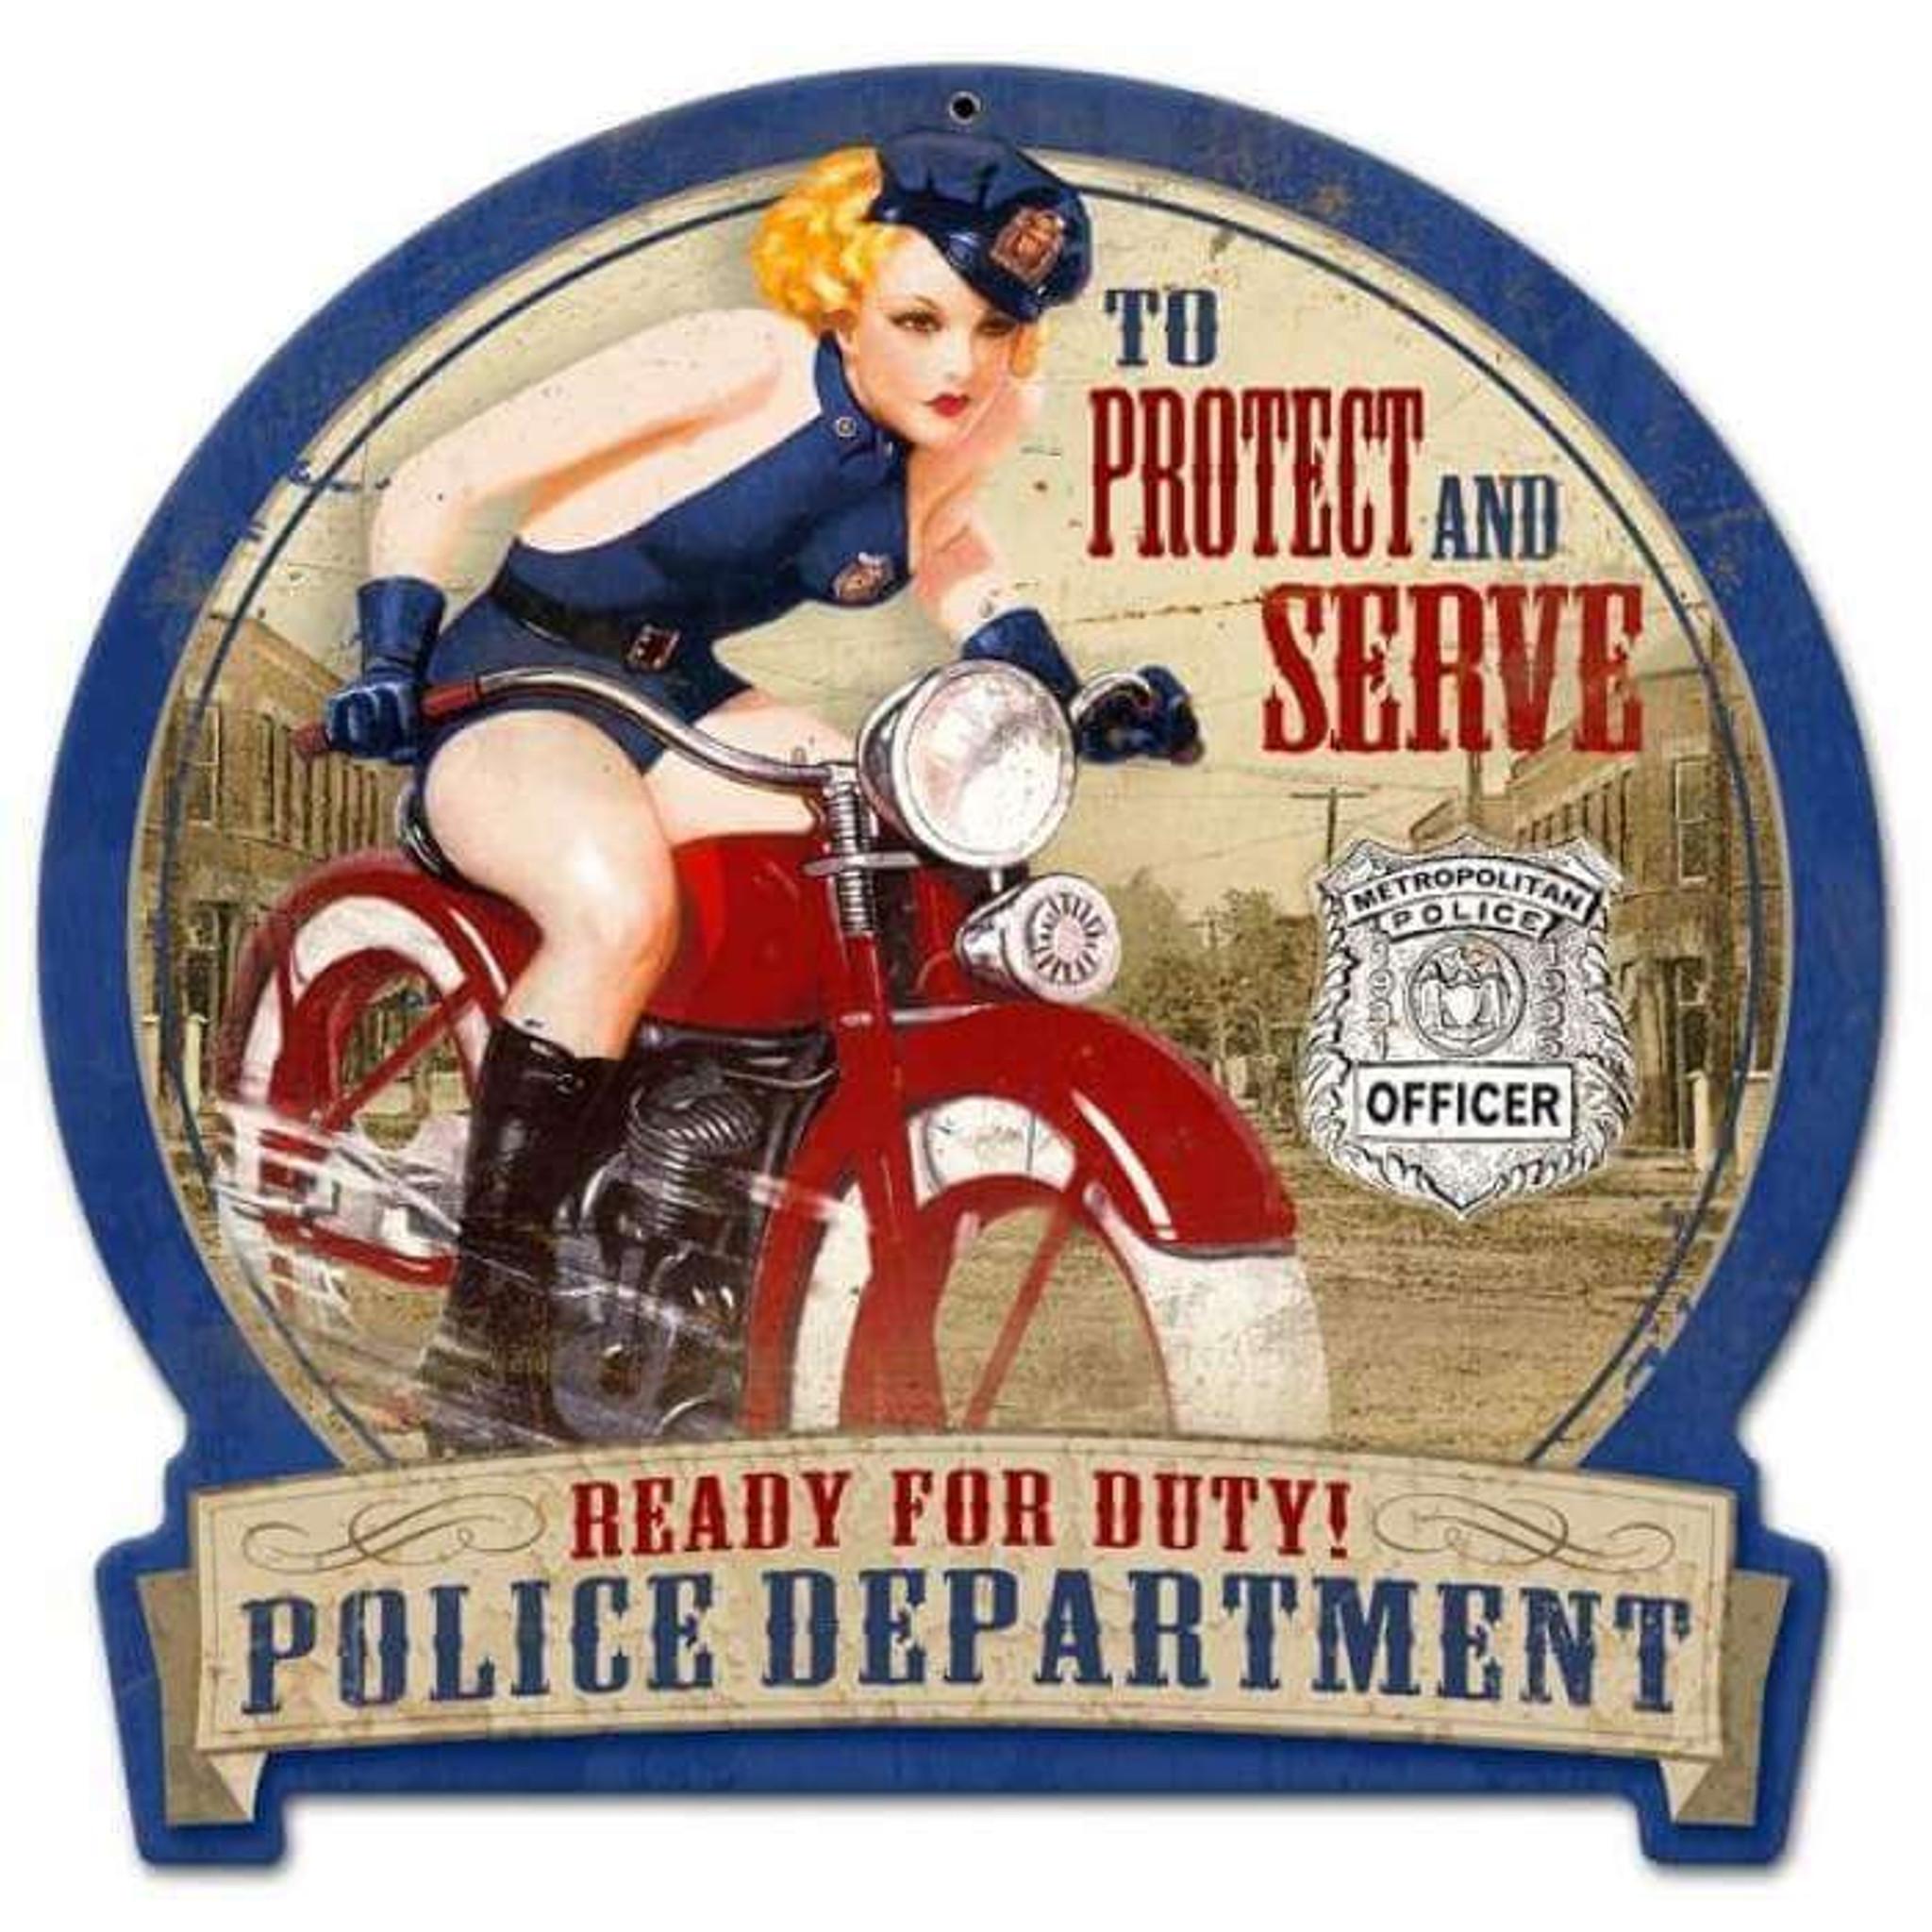 Retro Police Bike Round Banner Pin Up Girl Metal Sign 16